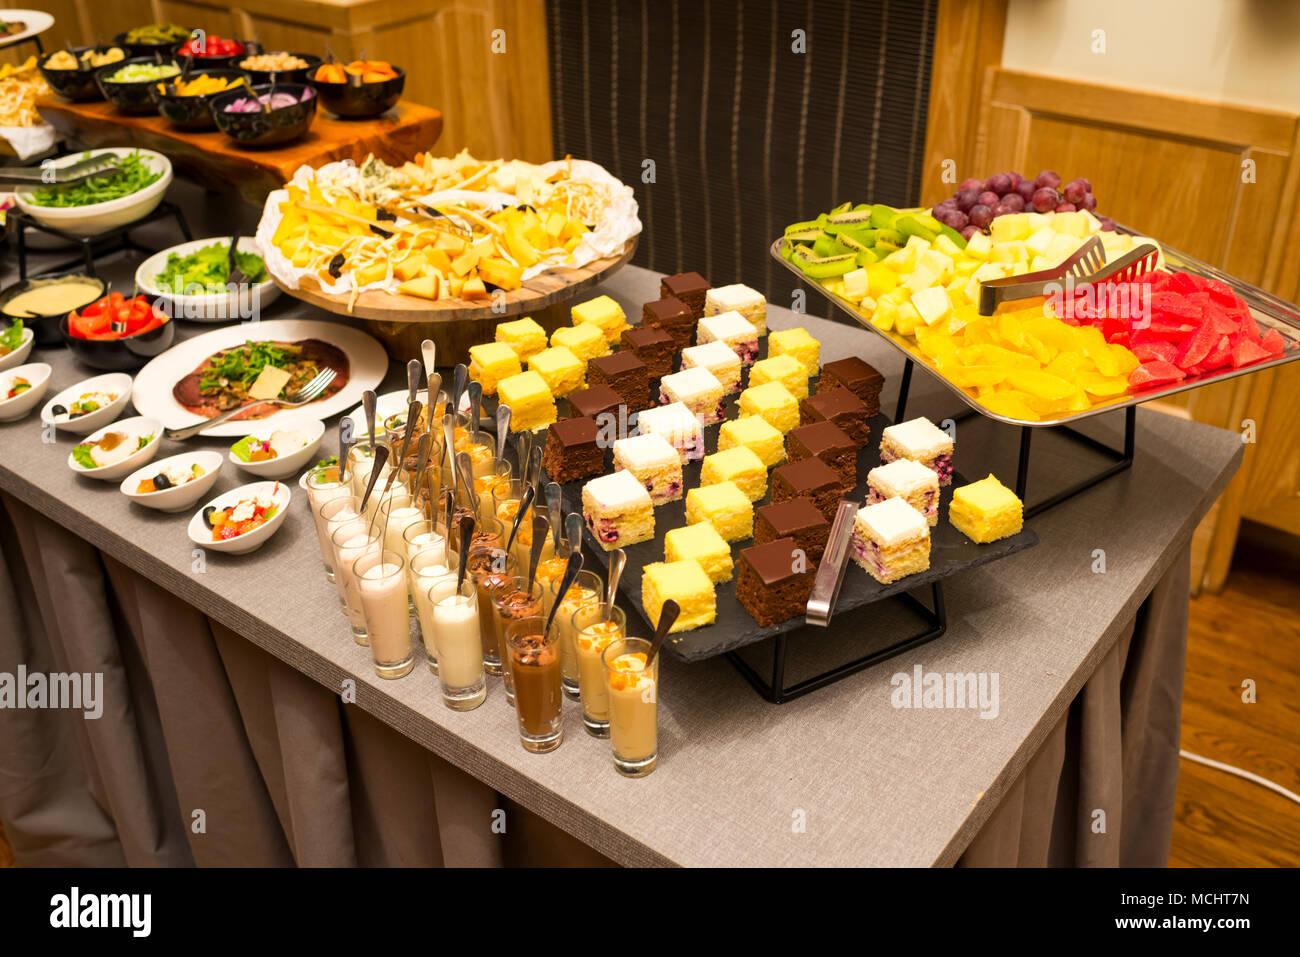 Buffet Di Dolci E Frutta : Catering varese buffet di dolci e torte